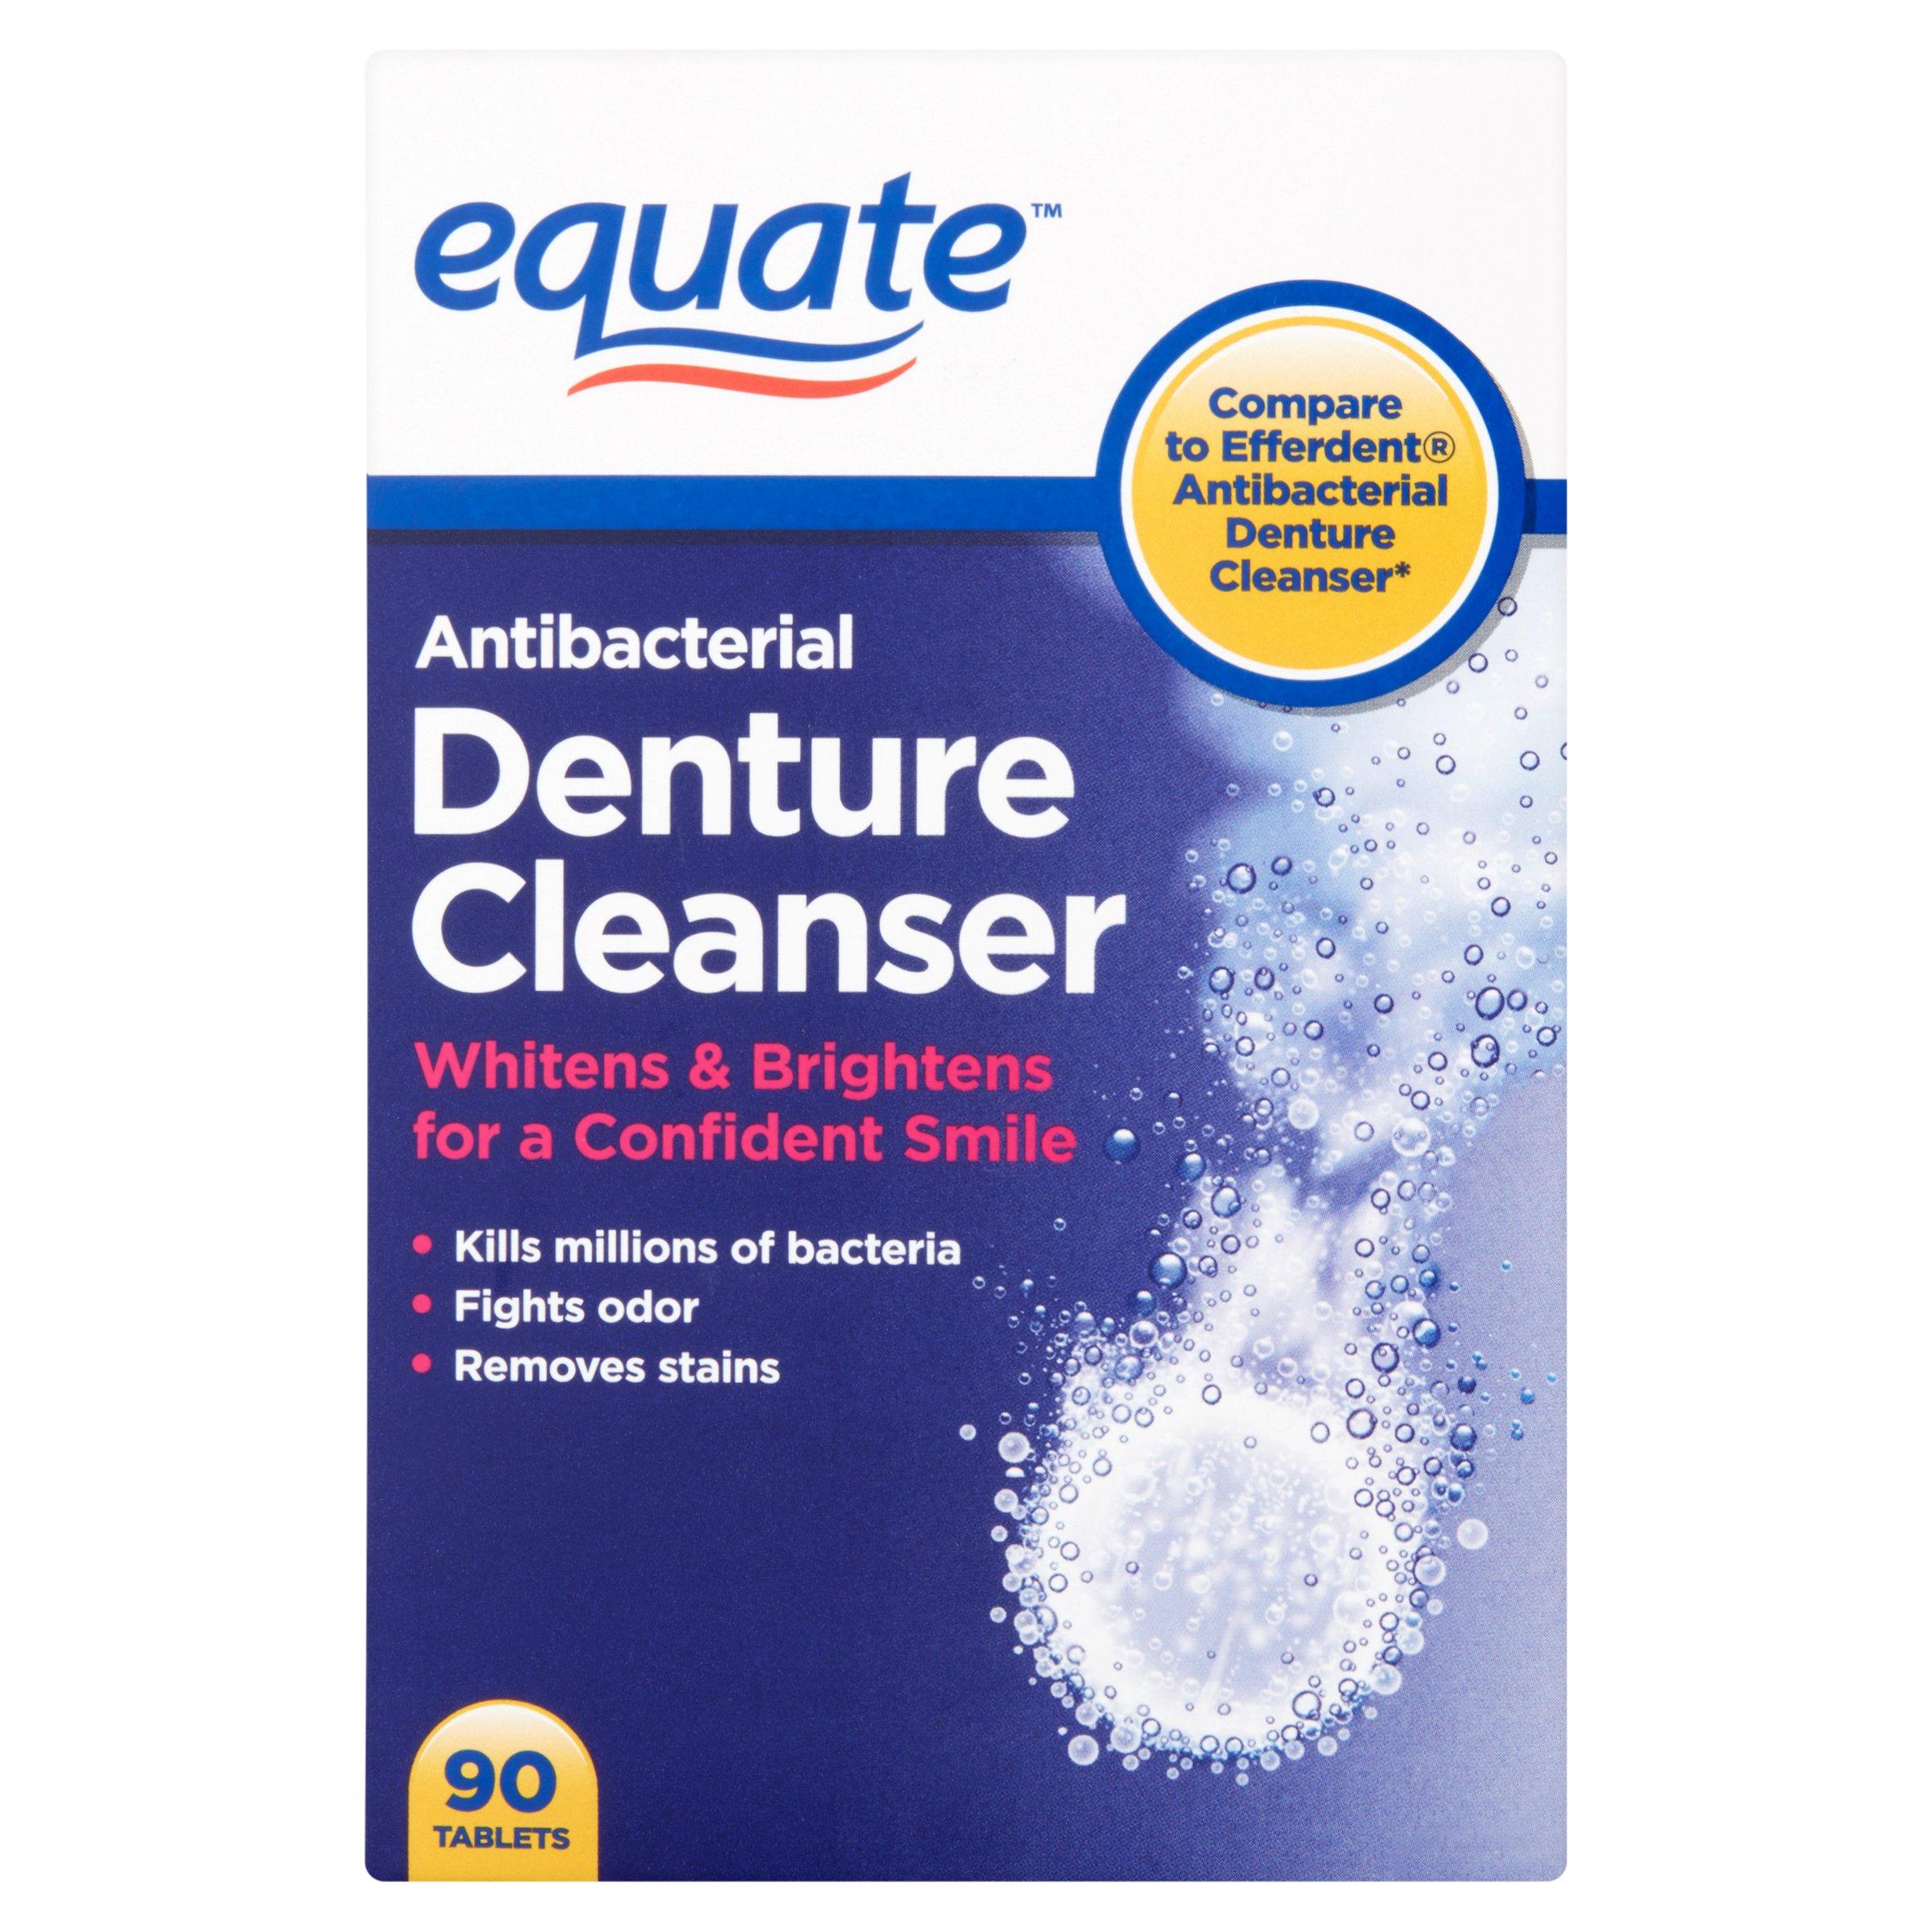 Equate Antibacterial Denture Cleanser Tablets, 90 Ct